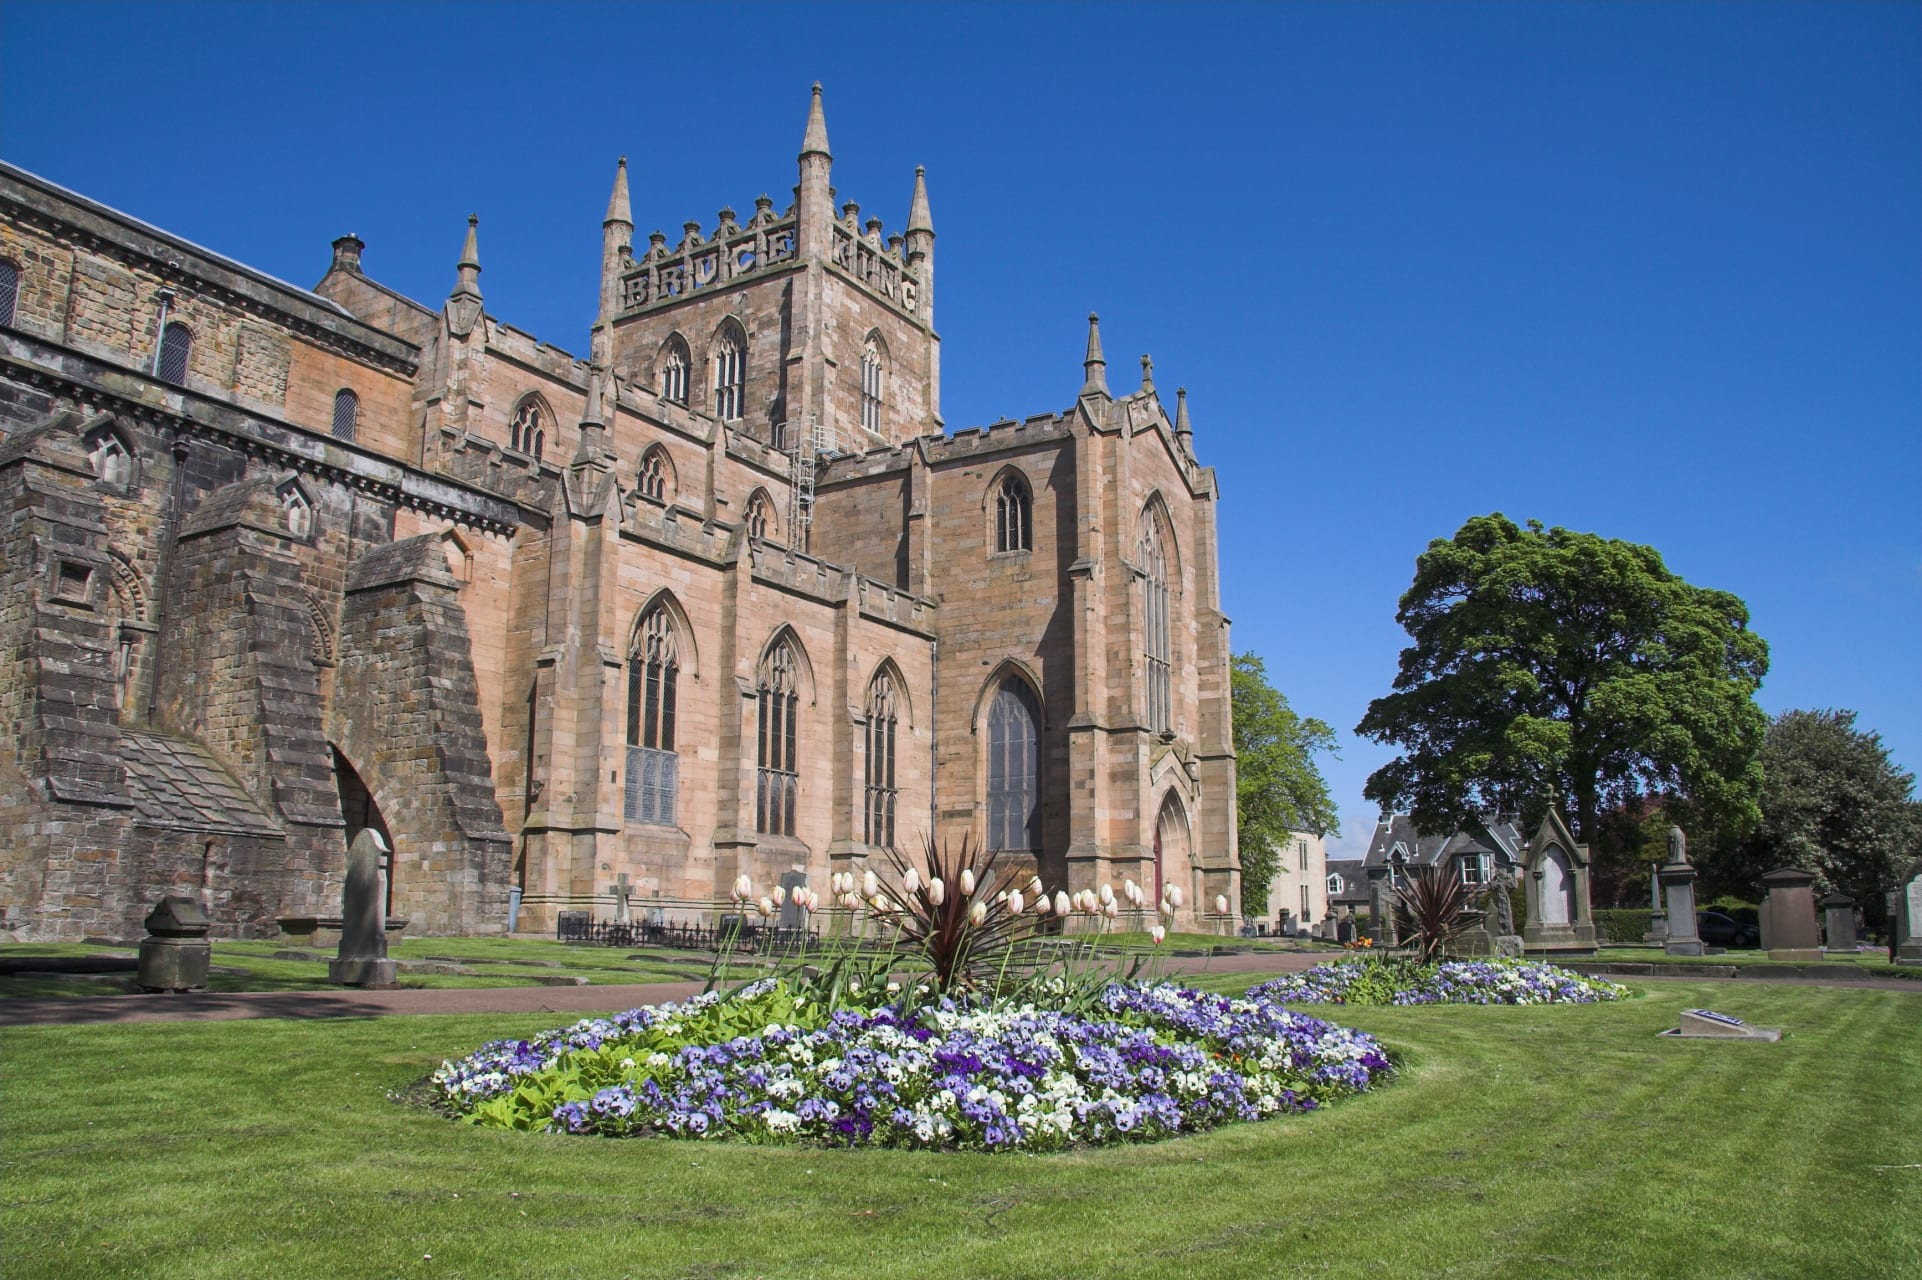 Central Scotland - Historic Dunfermline.